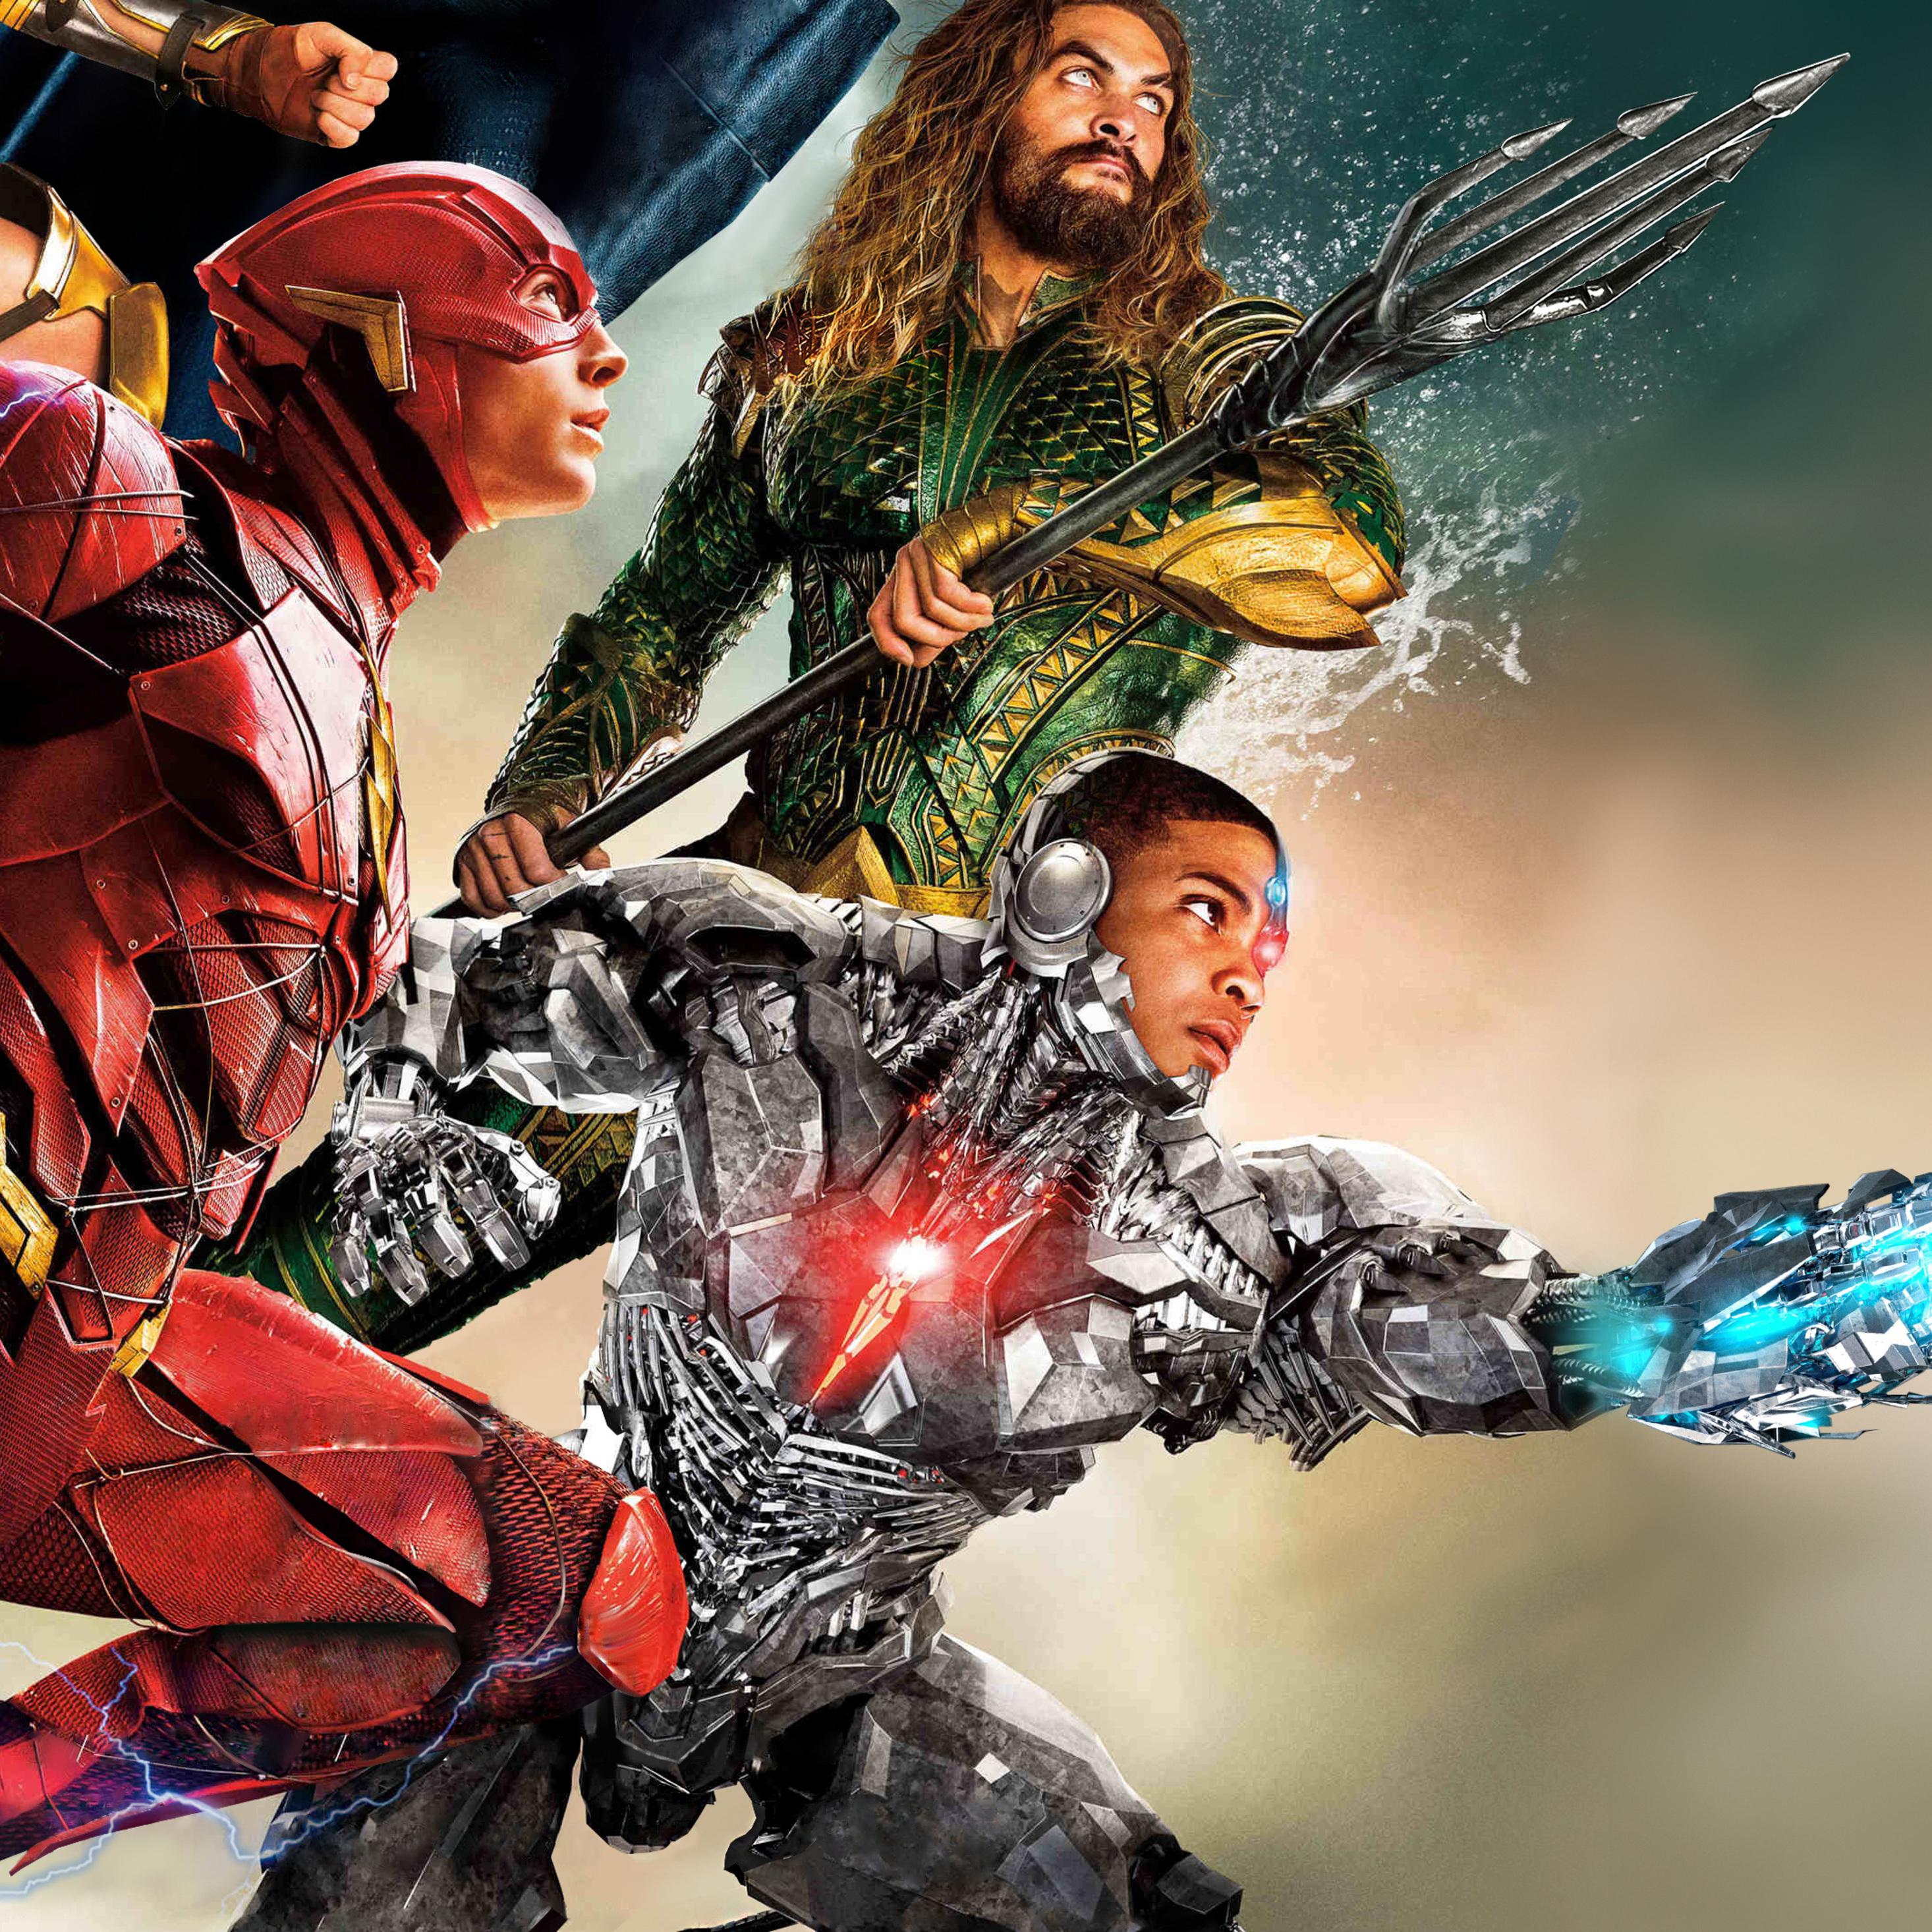 flash-cyborg-aquaman-justice-league-4k-zx.jpg